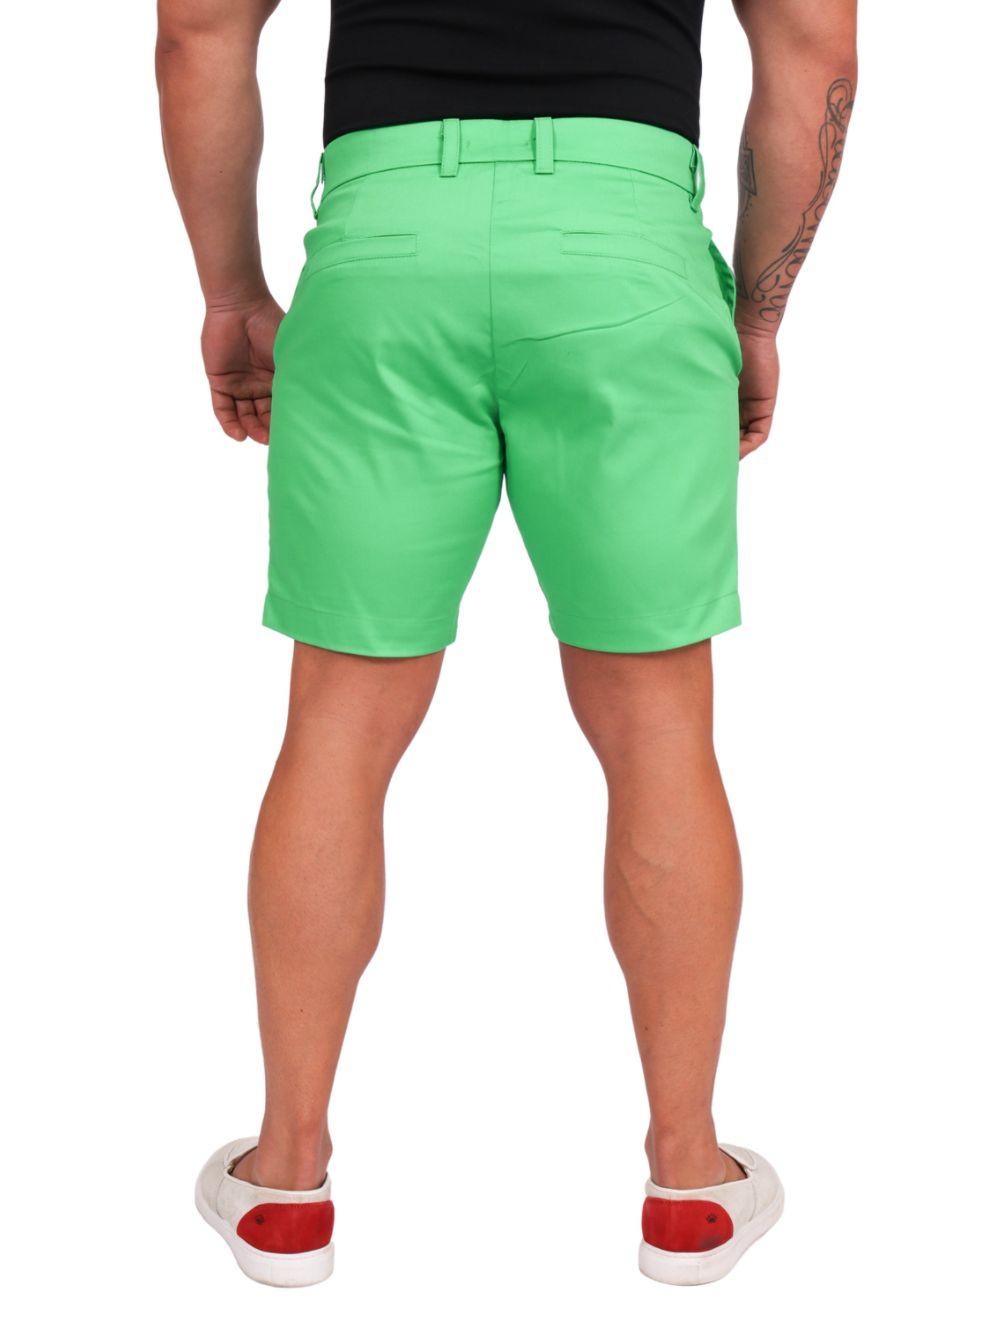 Bermuda Masculina Sarja com elastano Verde Claro